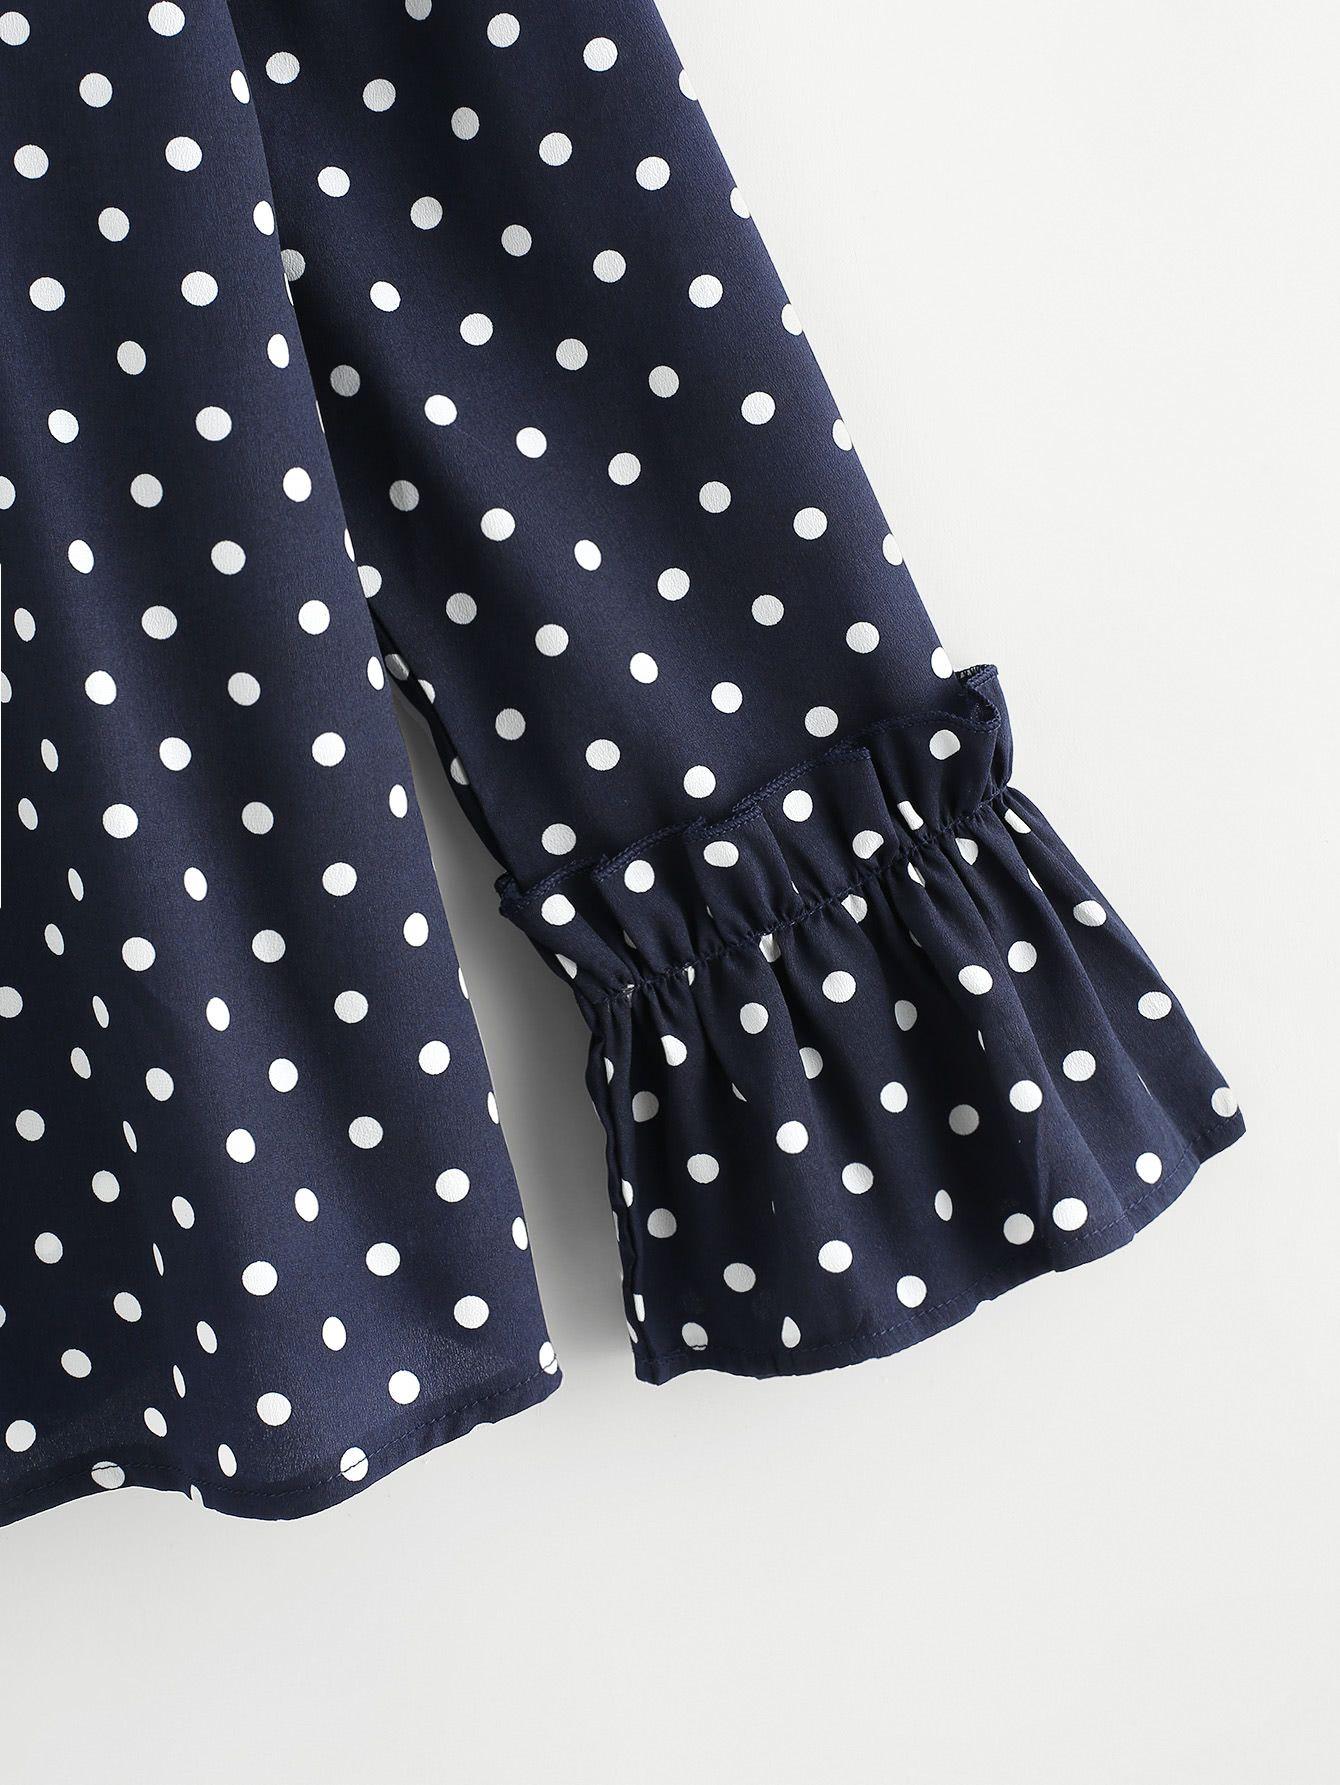 Frill Trim Polka Dot BlouseFor Women-romwe #blousedesigns